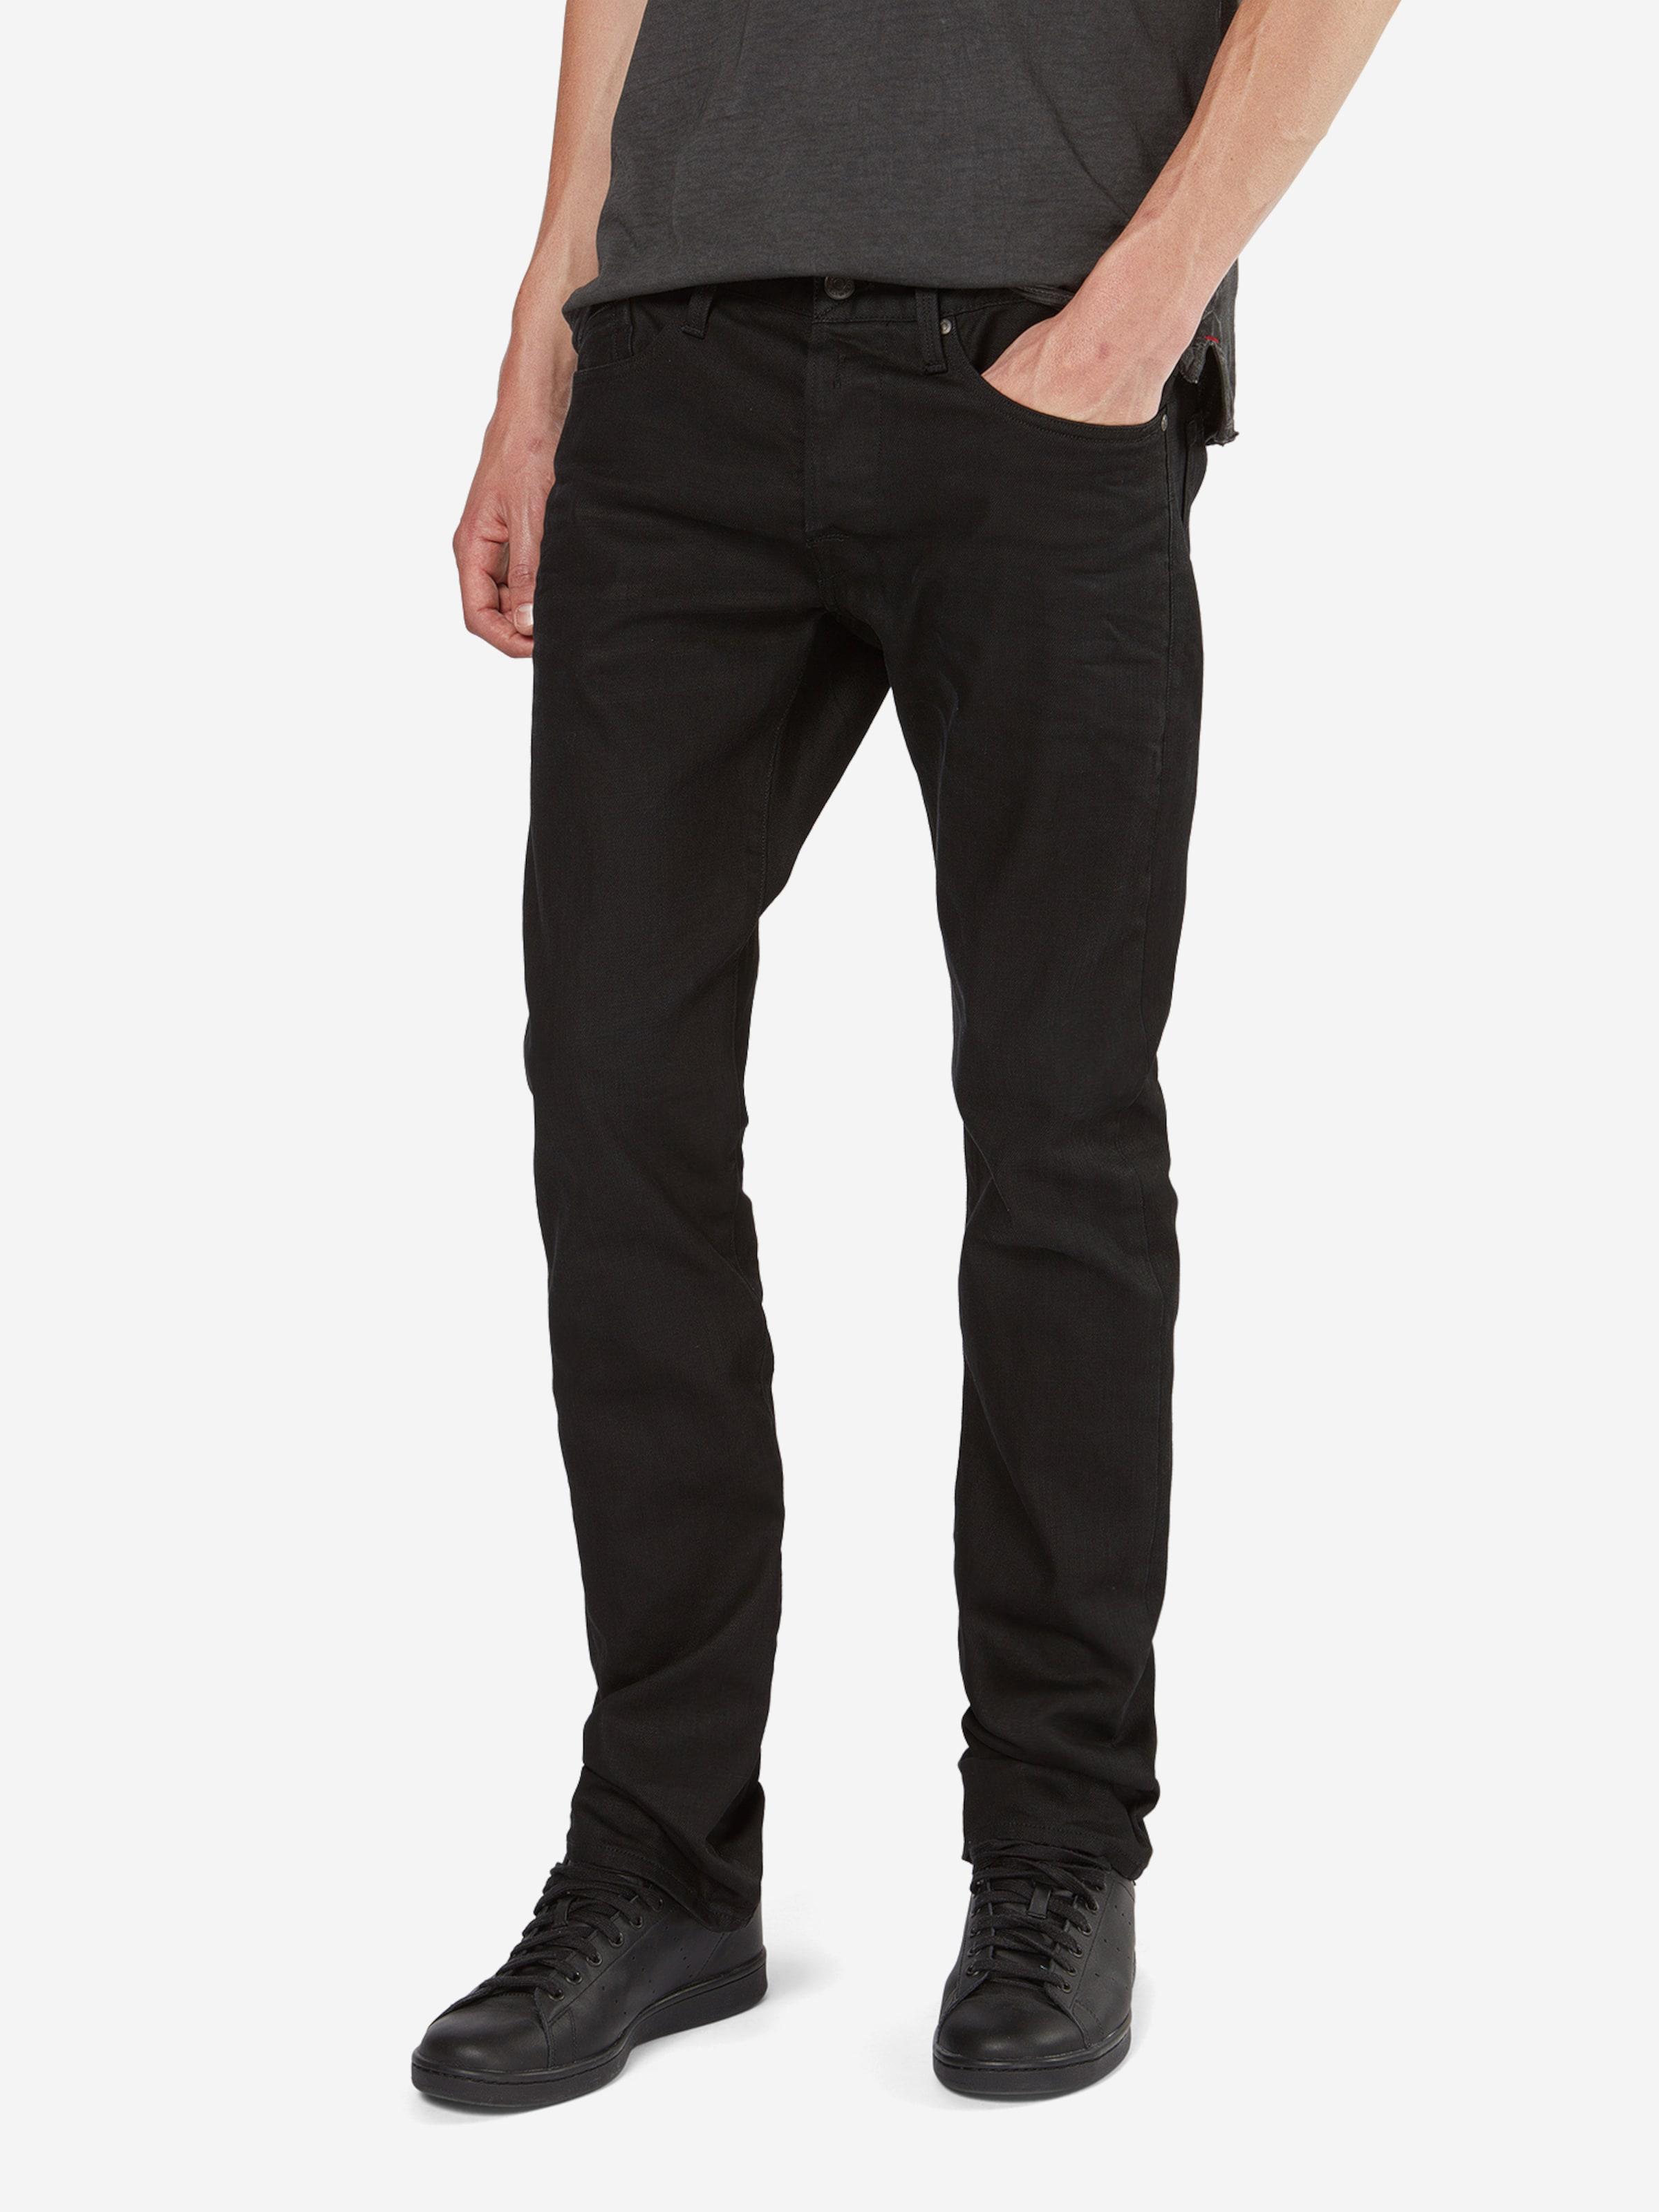 REPLAY Jeans 'Waitom' Rabatt Großhandelspreis Besuchen Online-Verkauf Neu SbUJj3